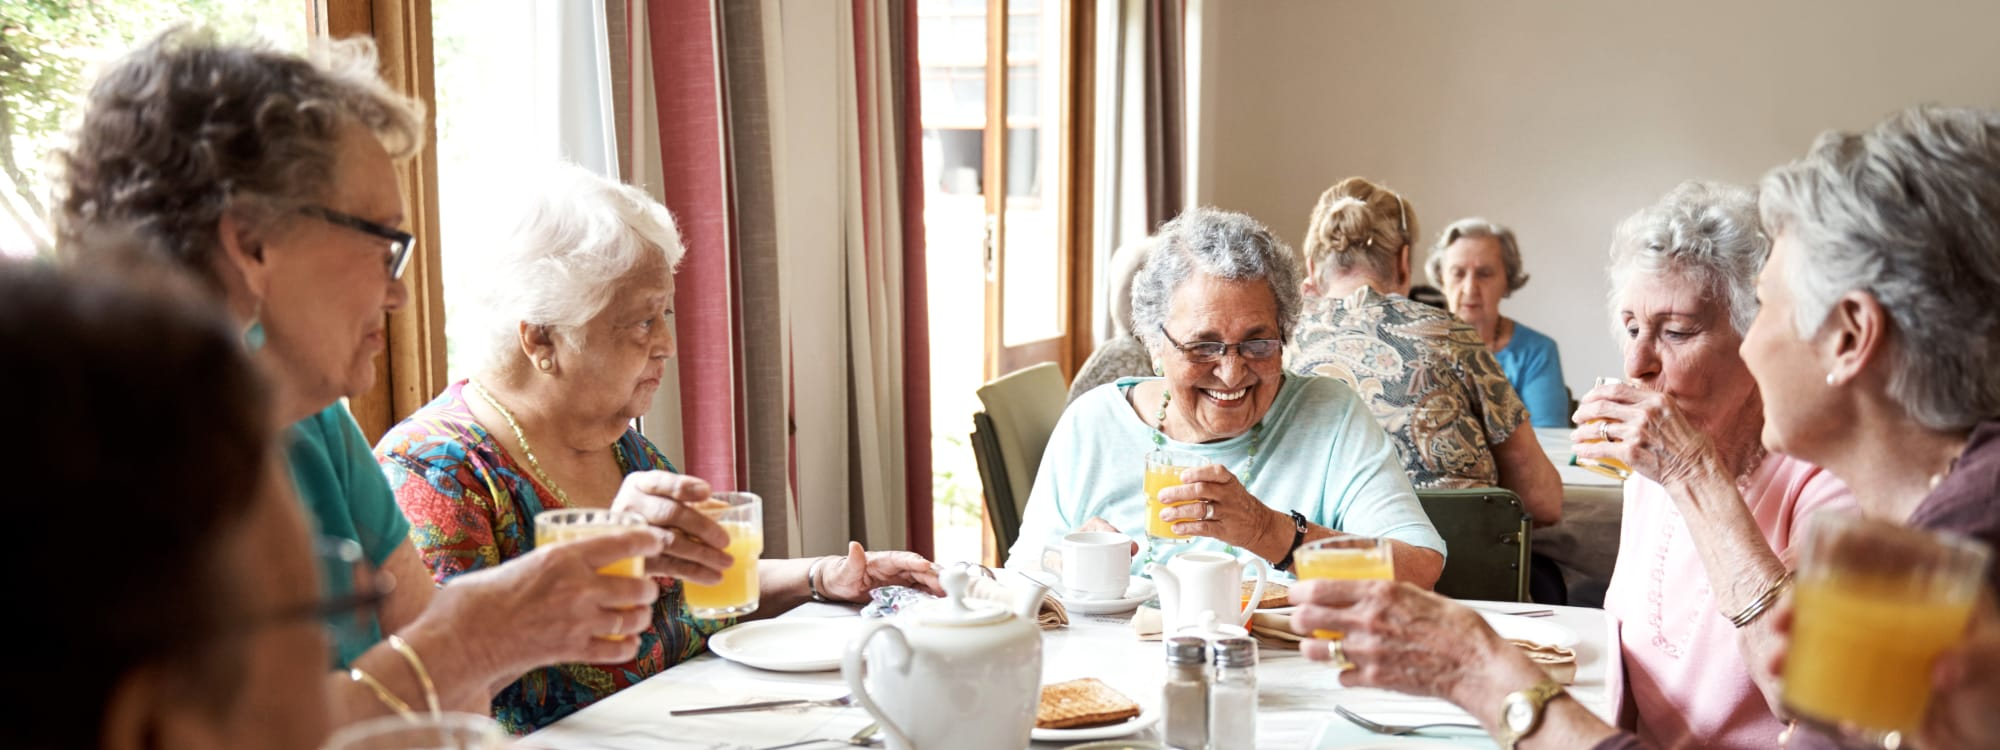 Services & Amenities at Arbor Glen Senior Living in Lake Elmo, Minnesota